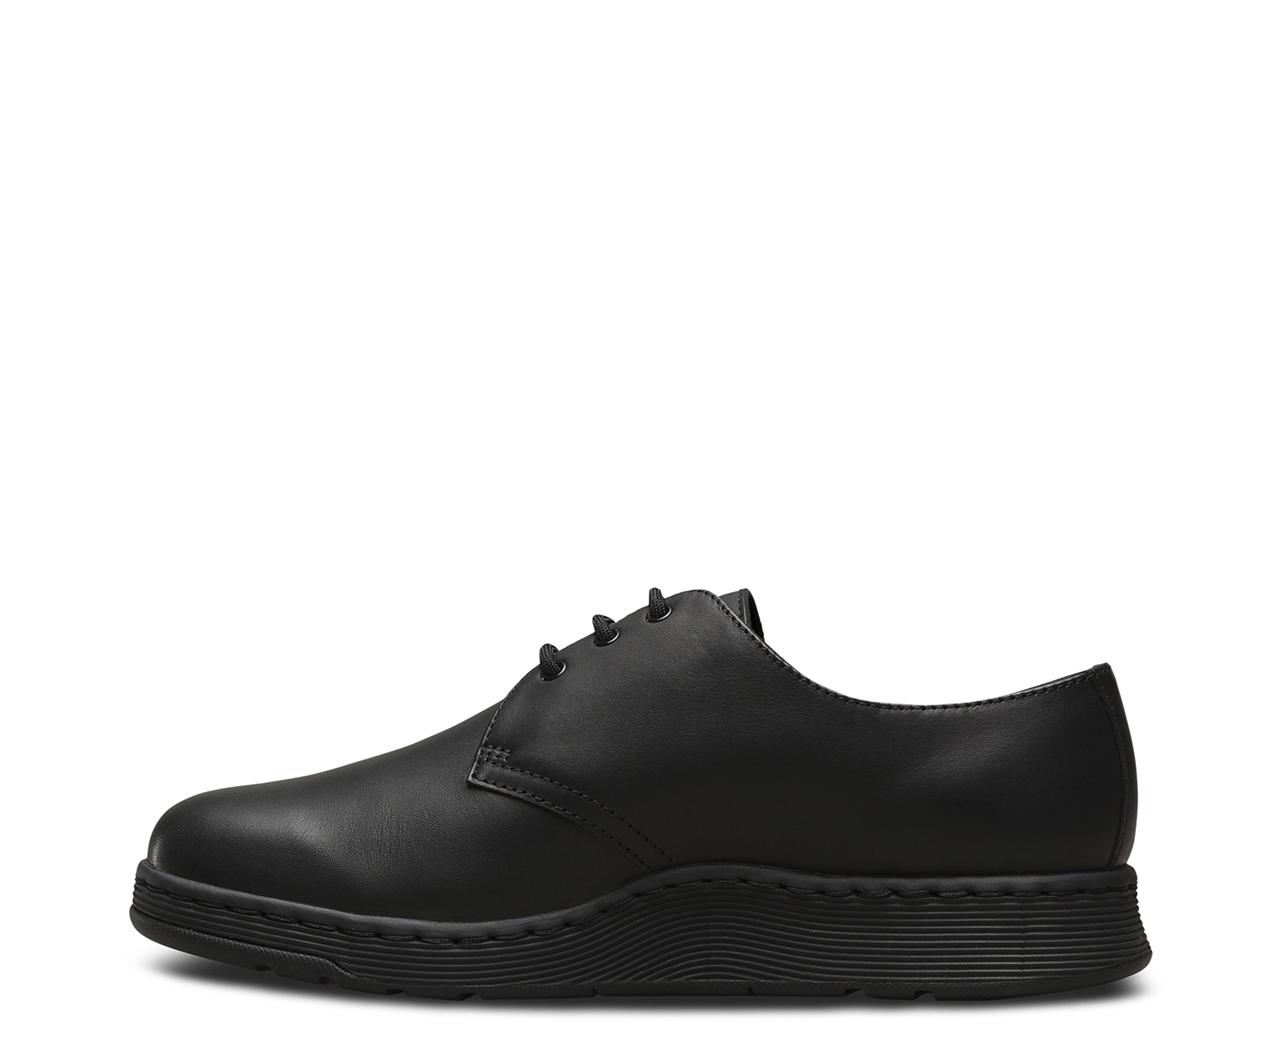 Dr. Martens Womens Cavendish 3-Eyelet Black Leather Shoes 39 EU ivFU7qs